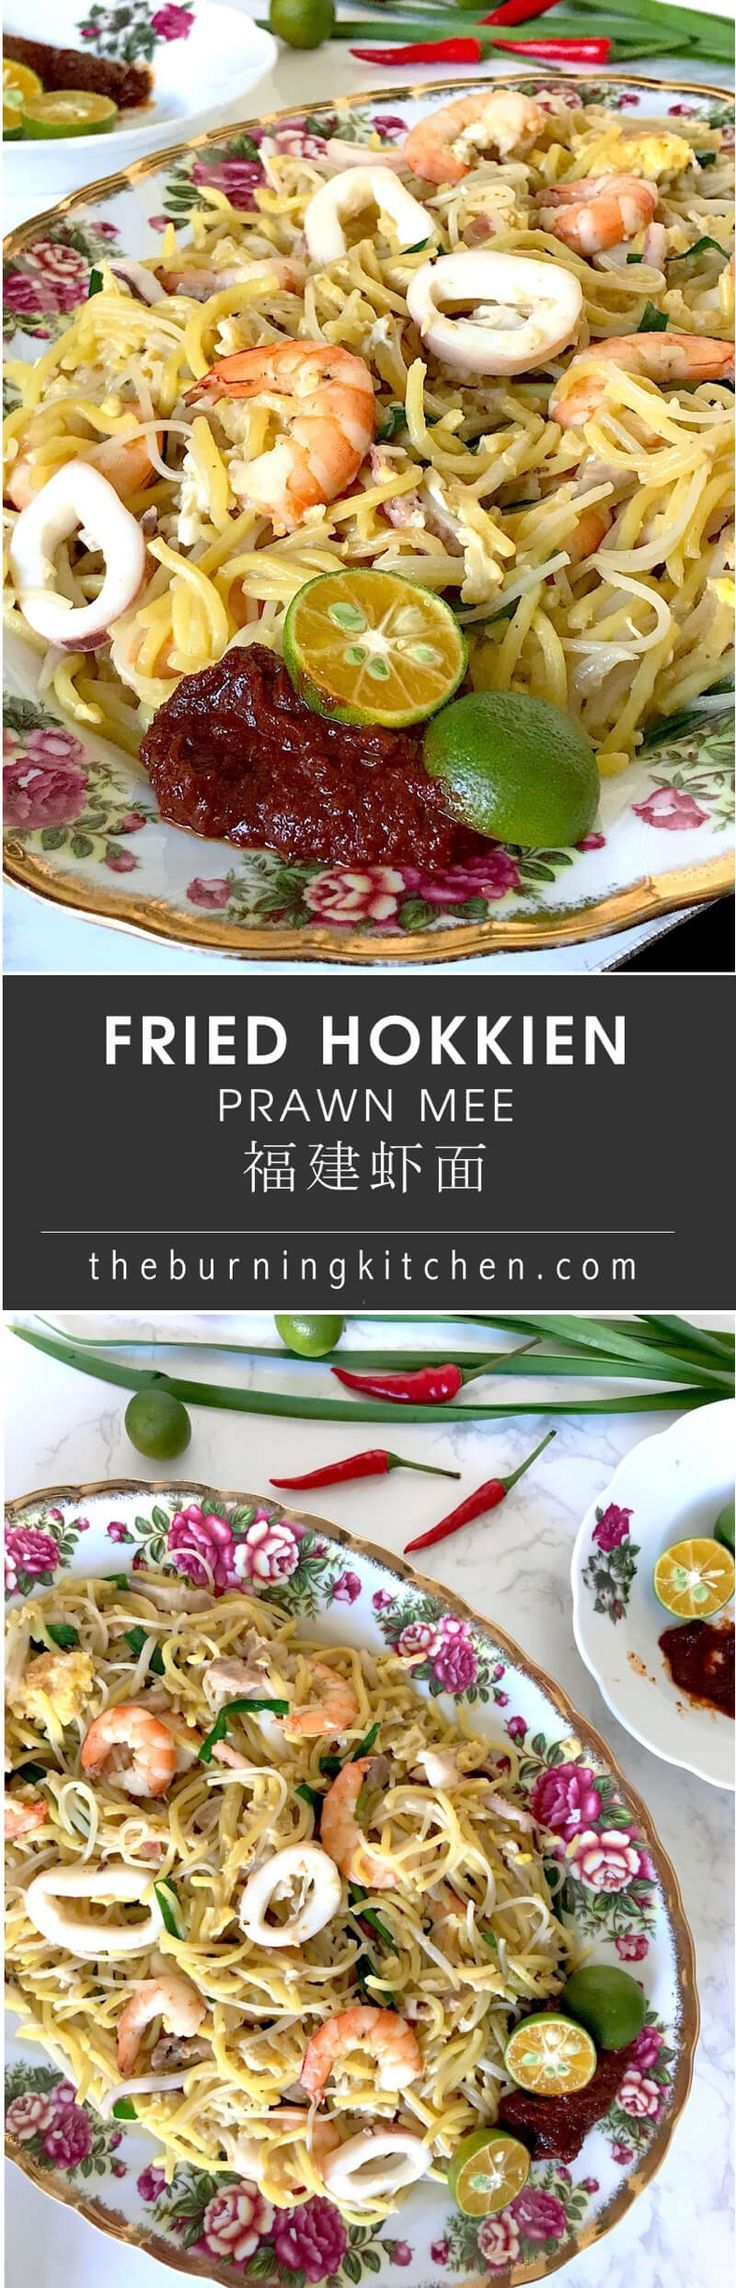 Fried hokkien prawn mee Recipe Asian recipes, Yummy